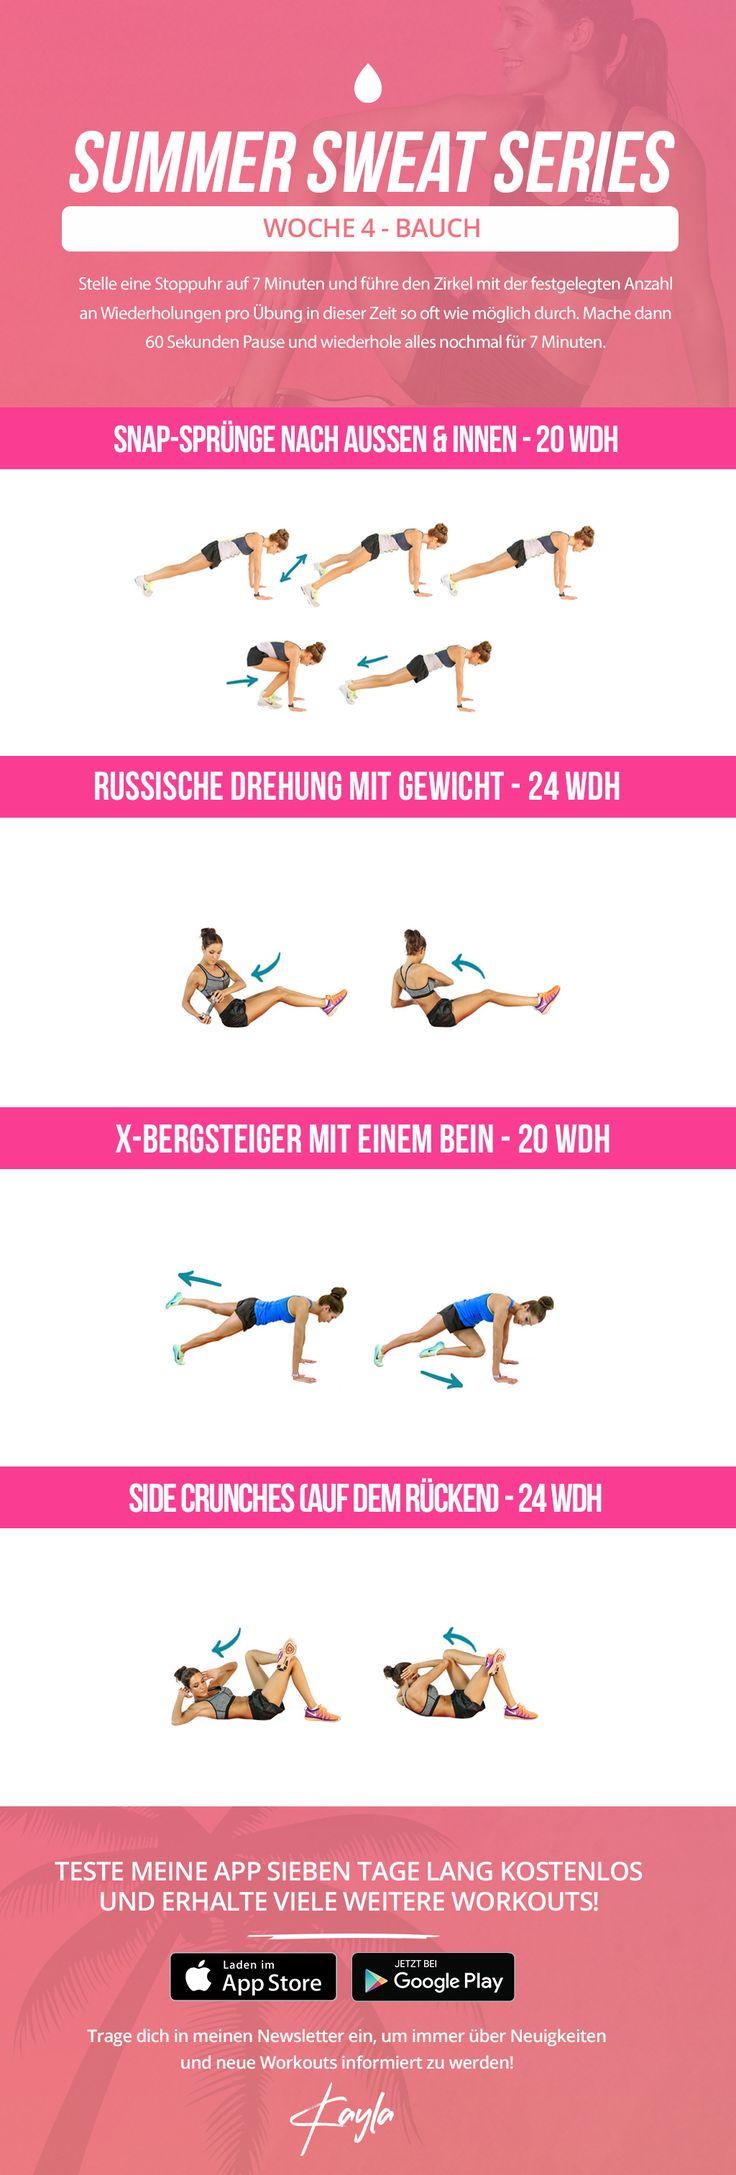 kayla itsines summer sweat series, summer sweat series friday week 4 , free kayla itsines workout